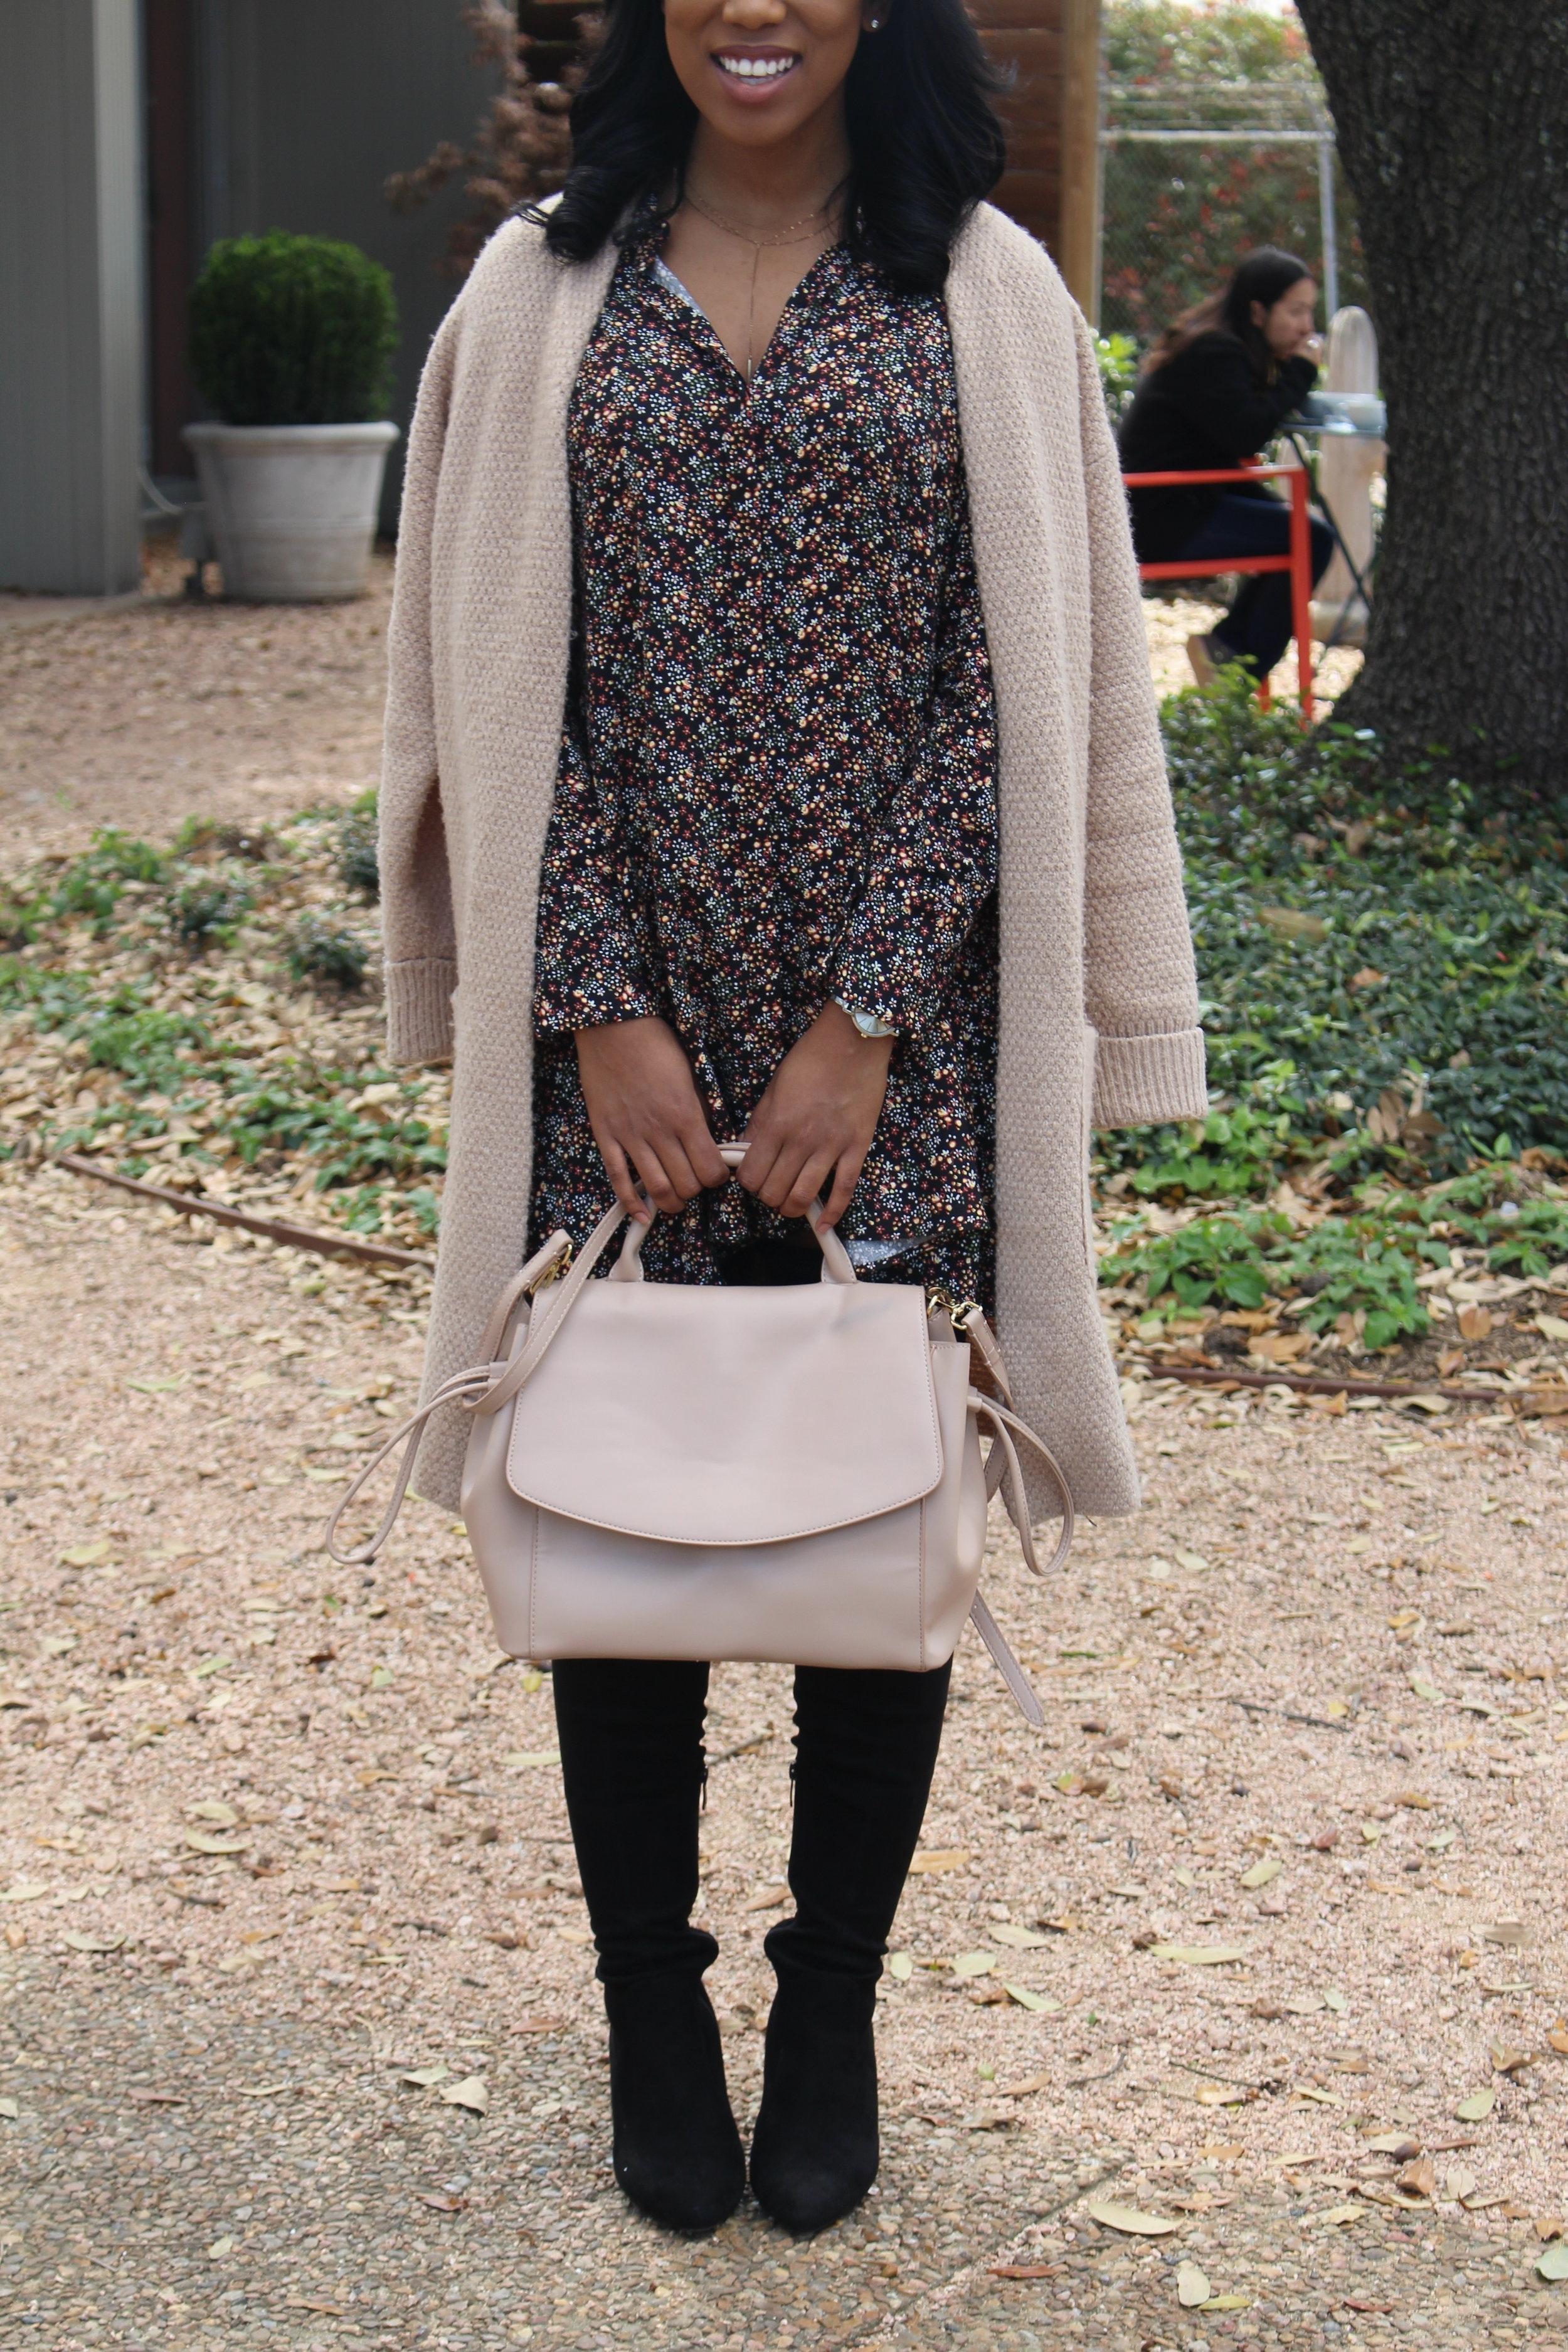 Sweater:  Forever21 (similar)  Dress:  Zara   Bag:  Zara  (similar)   Boots:  Public Desire